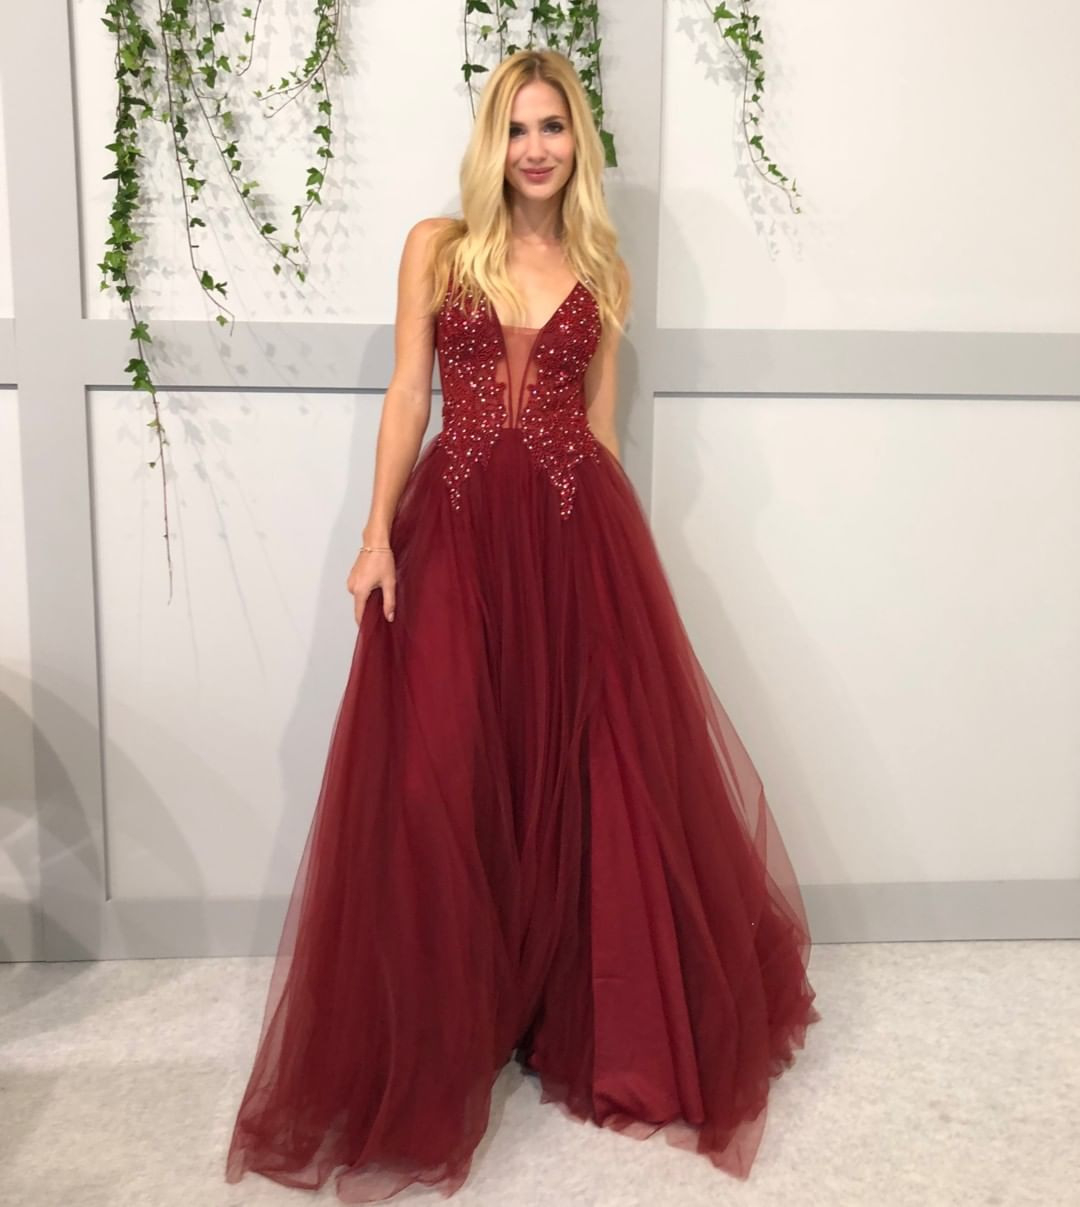 15 Elegant Rot Abend Kleid Design15 Großartig Rot Abend Kleid Ärmel